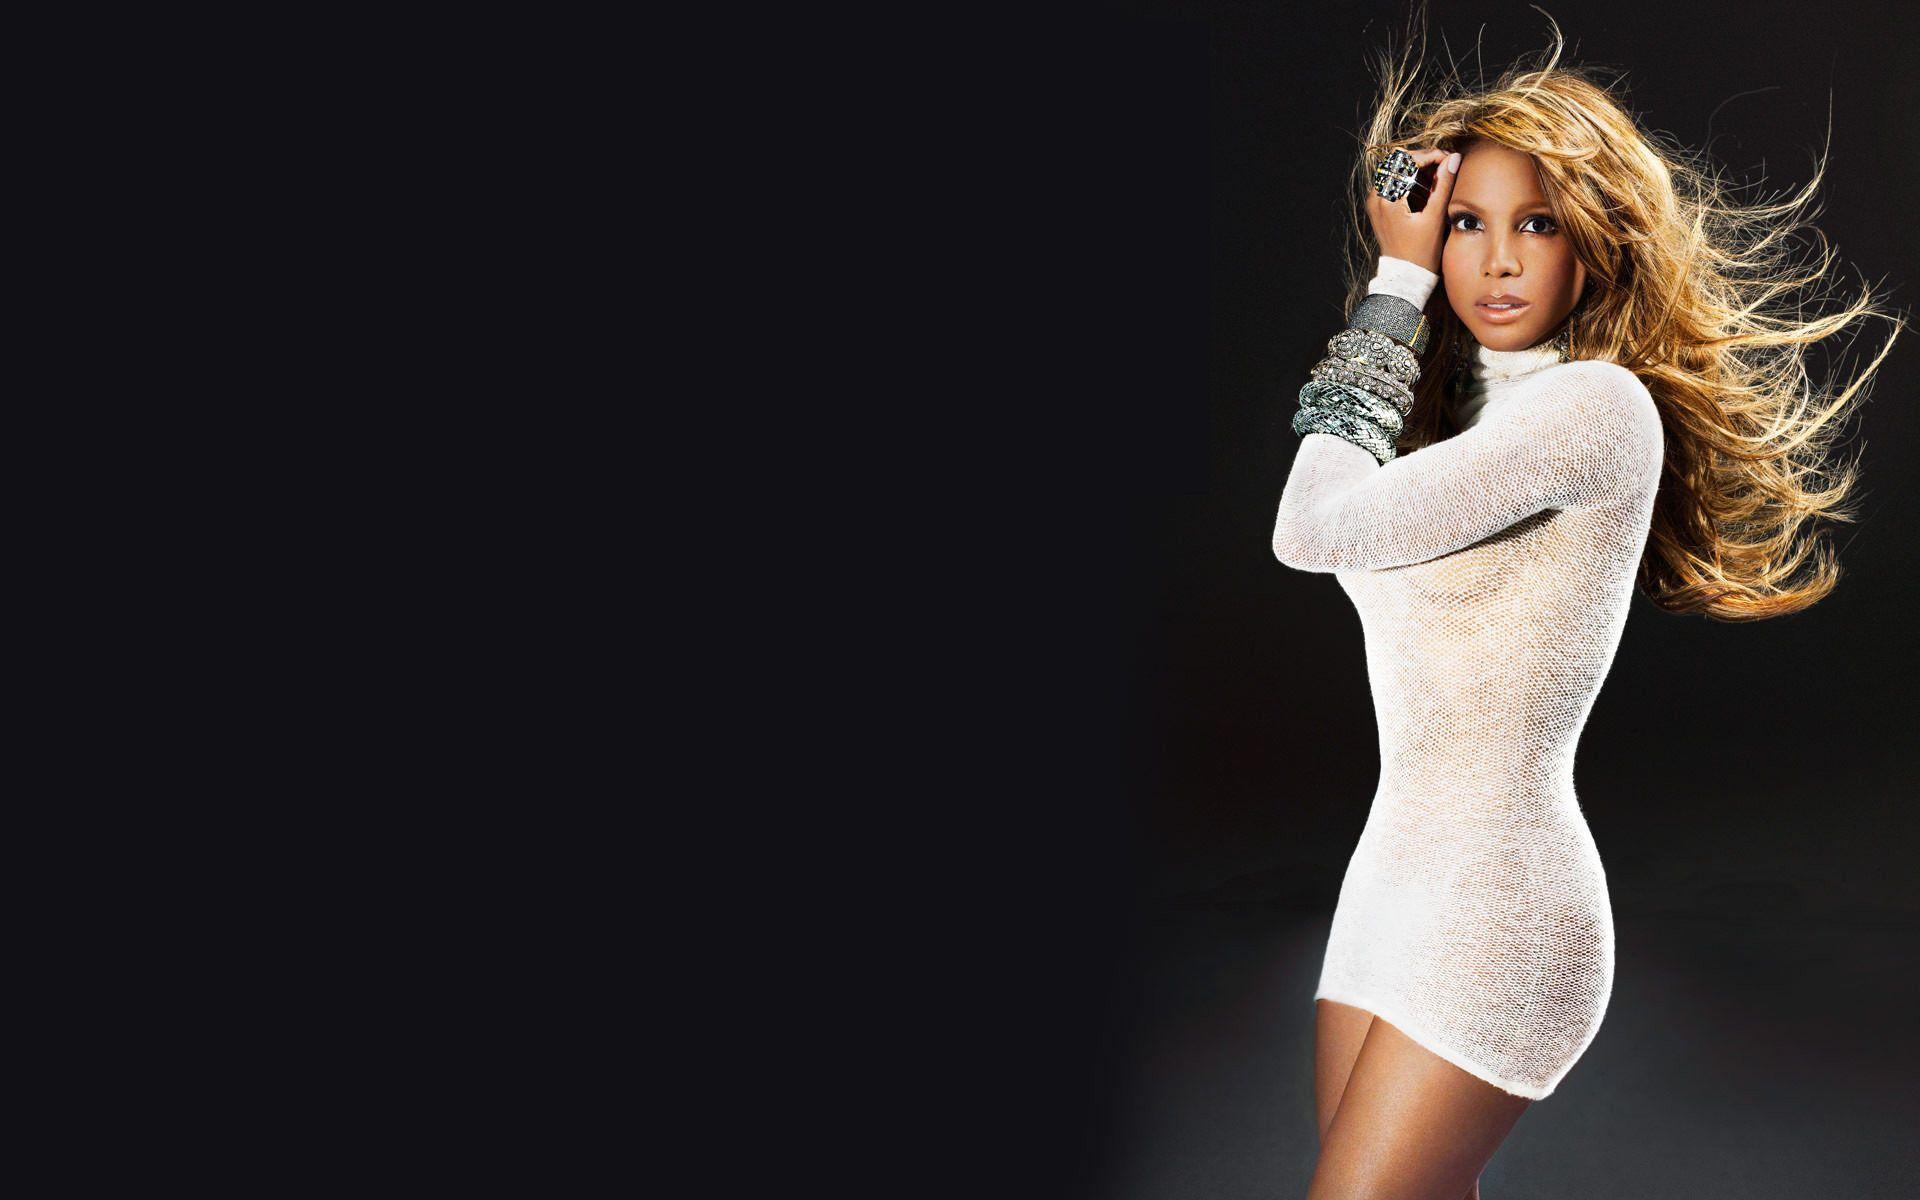 Britney spears porn music video - 2 part 3